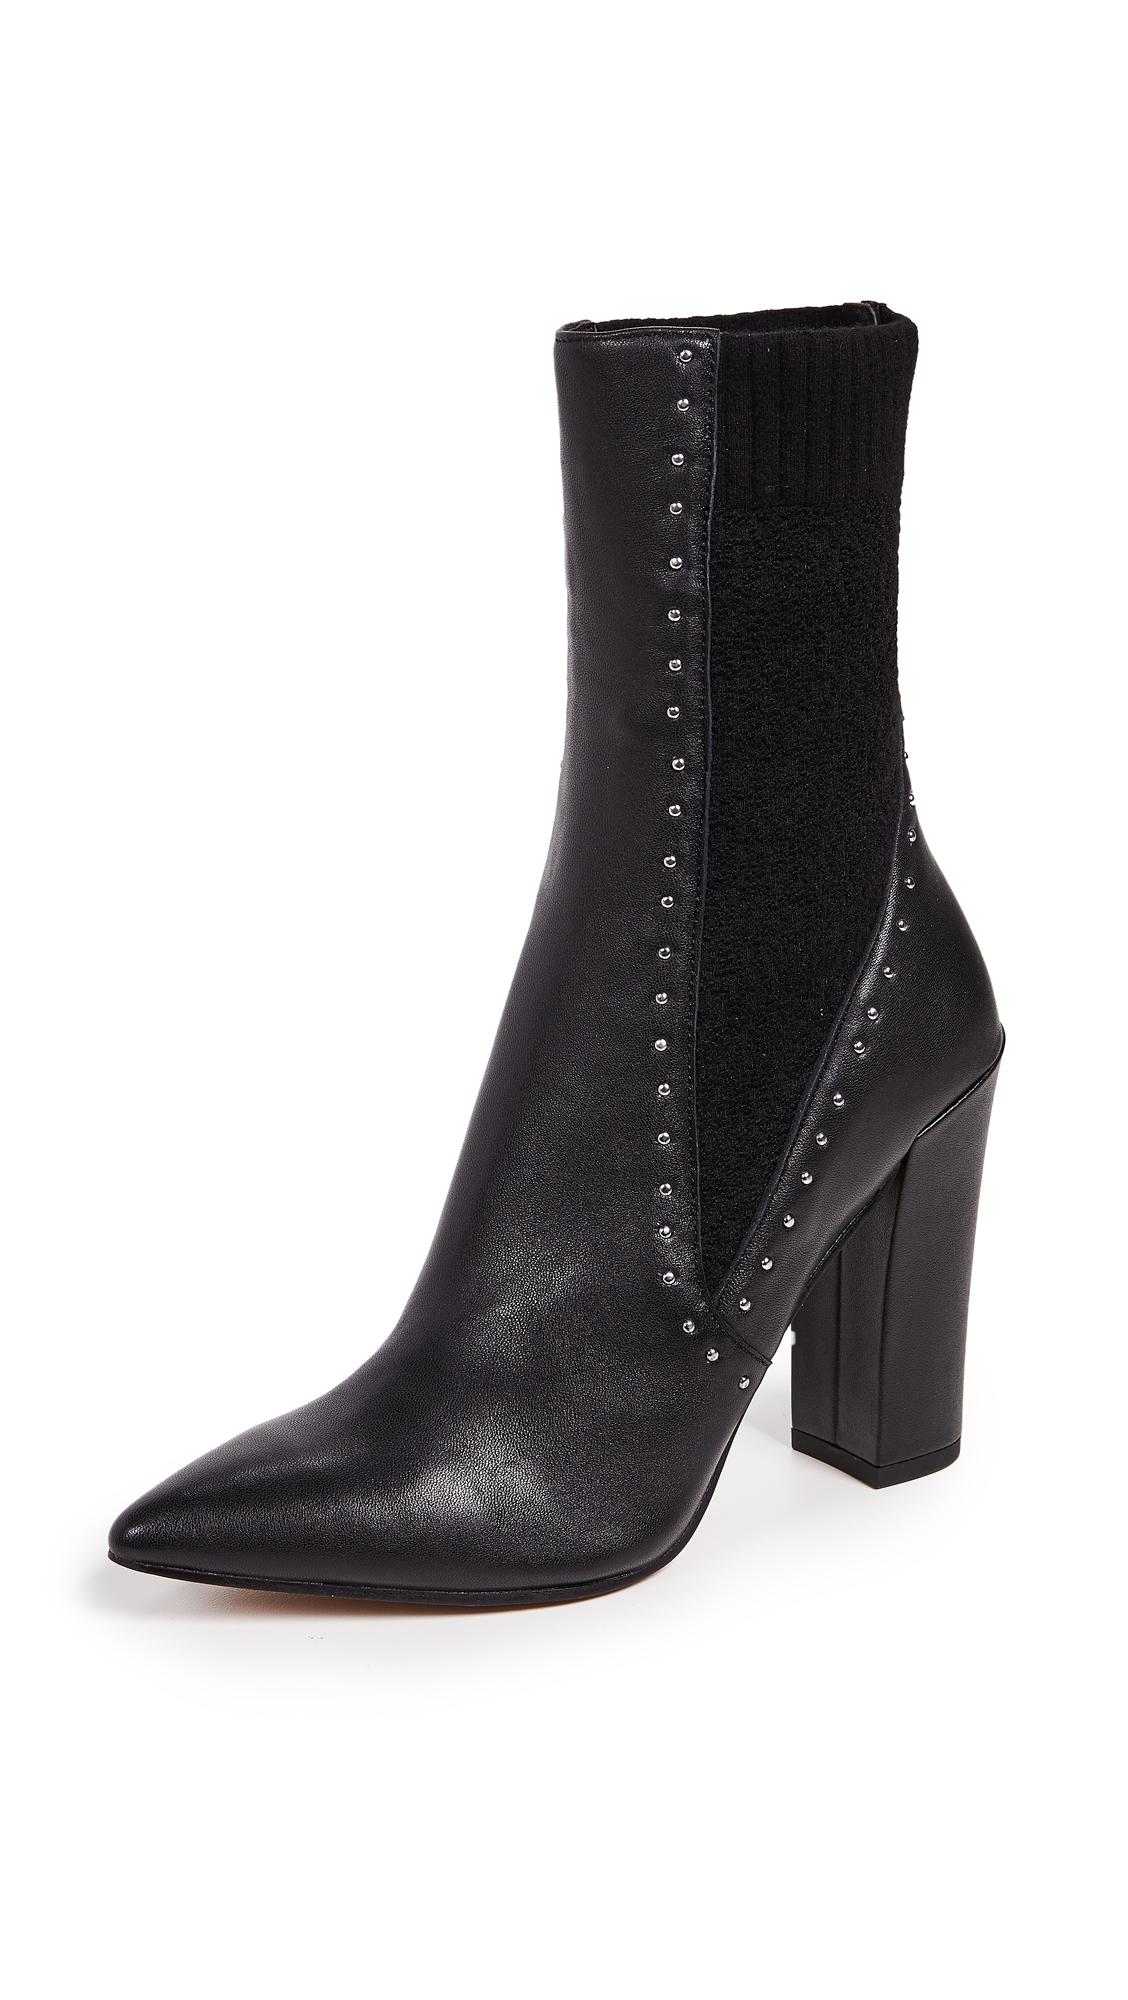 Dolce Vita Echo Block Heel Boots - Black